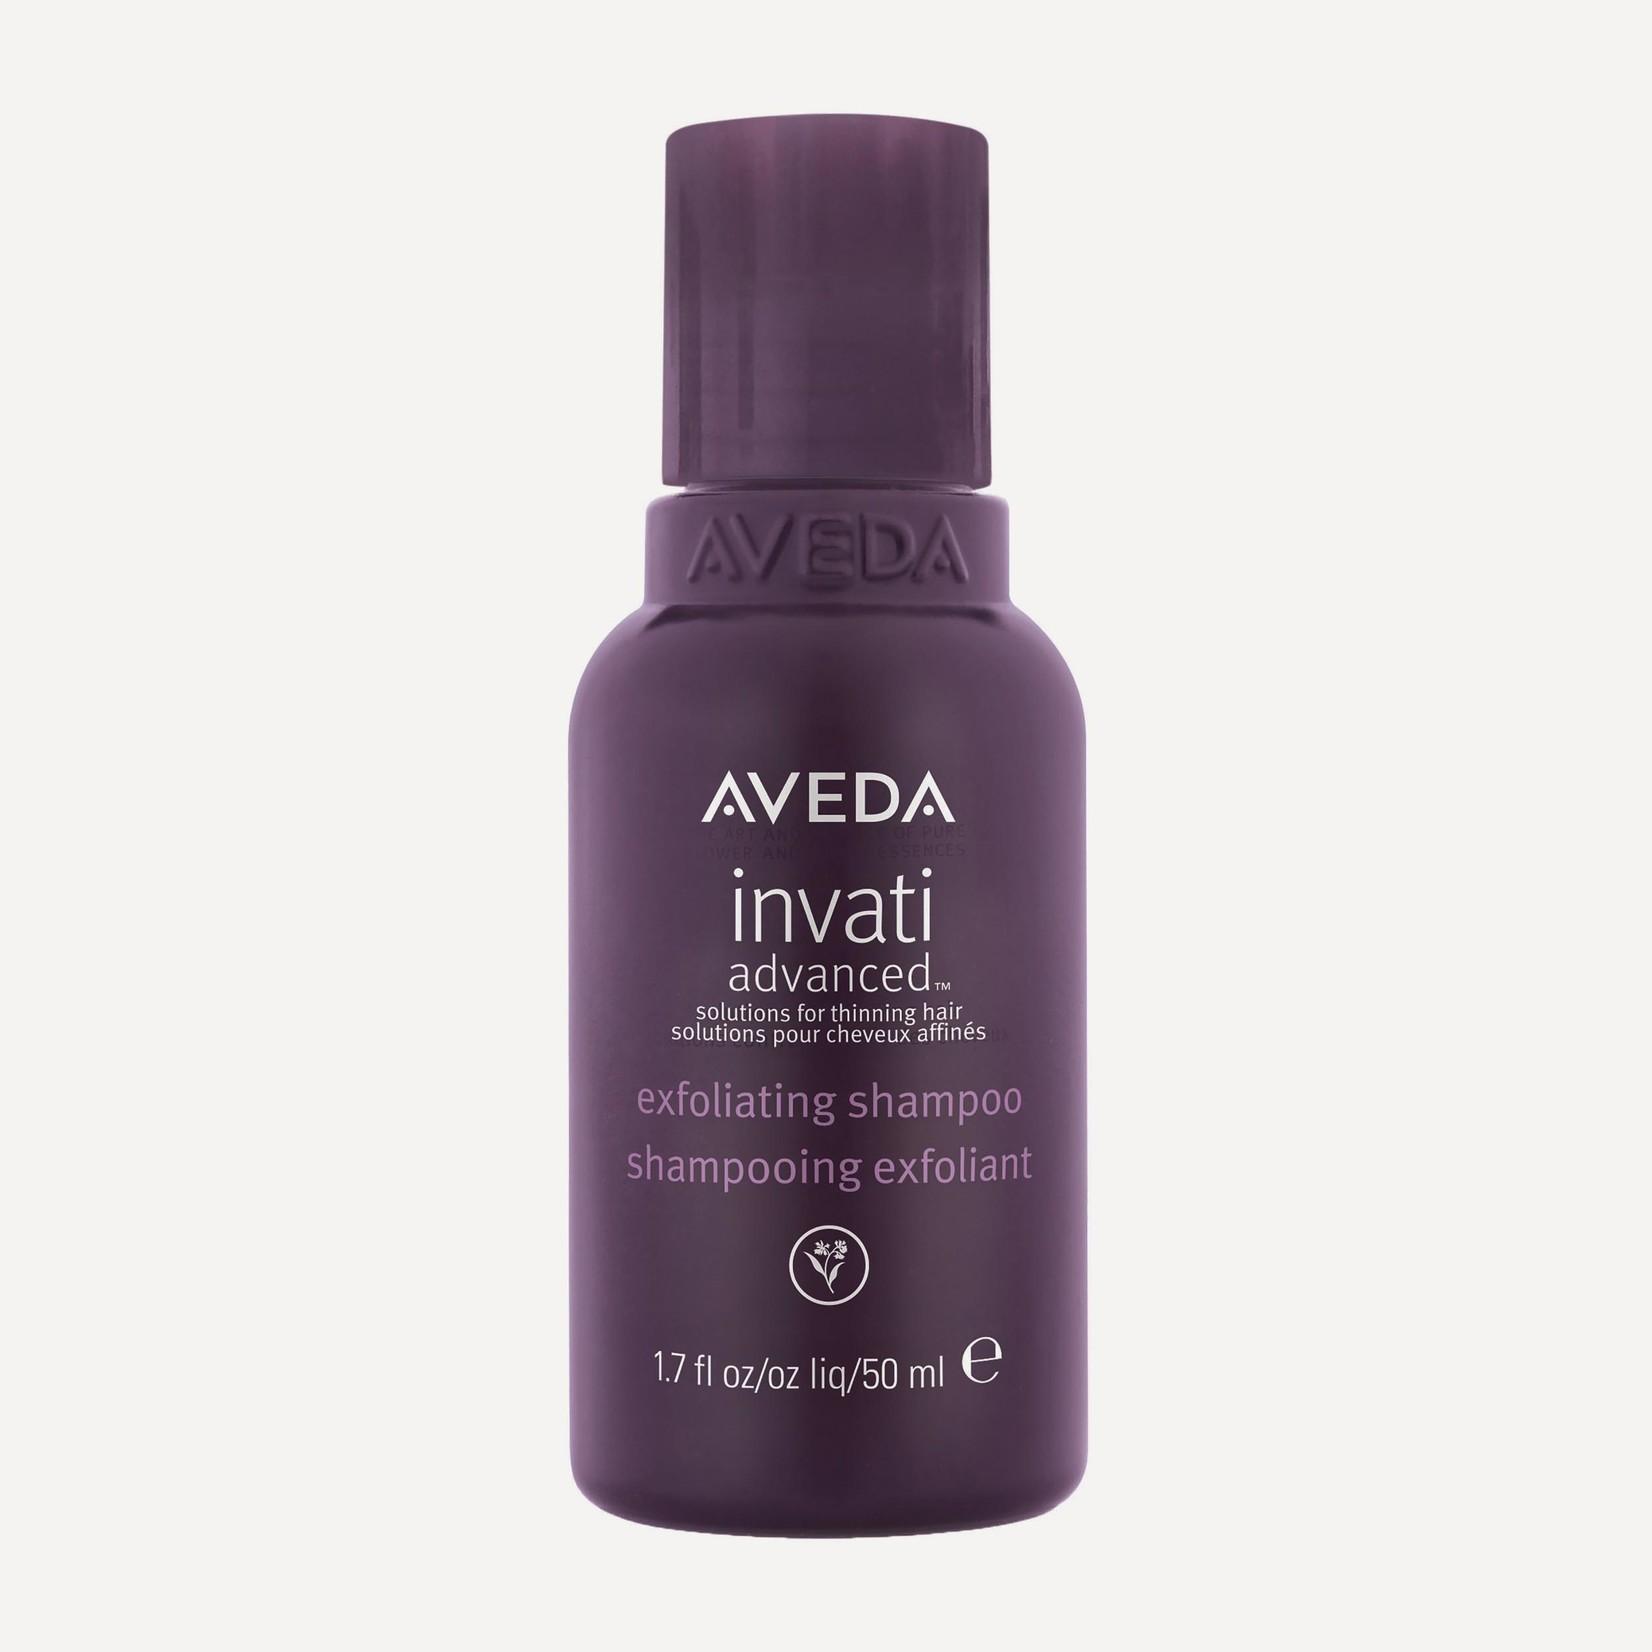 AVEDA Invati Advanced™ Exfoliating Shampoo Rich